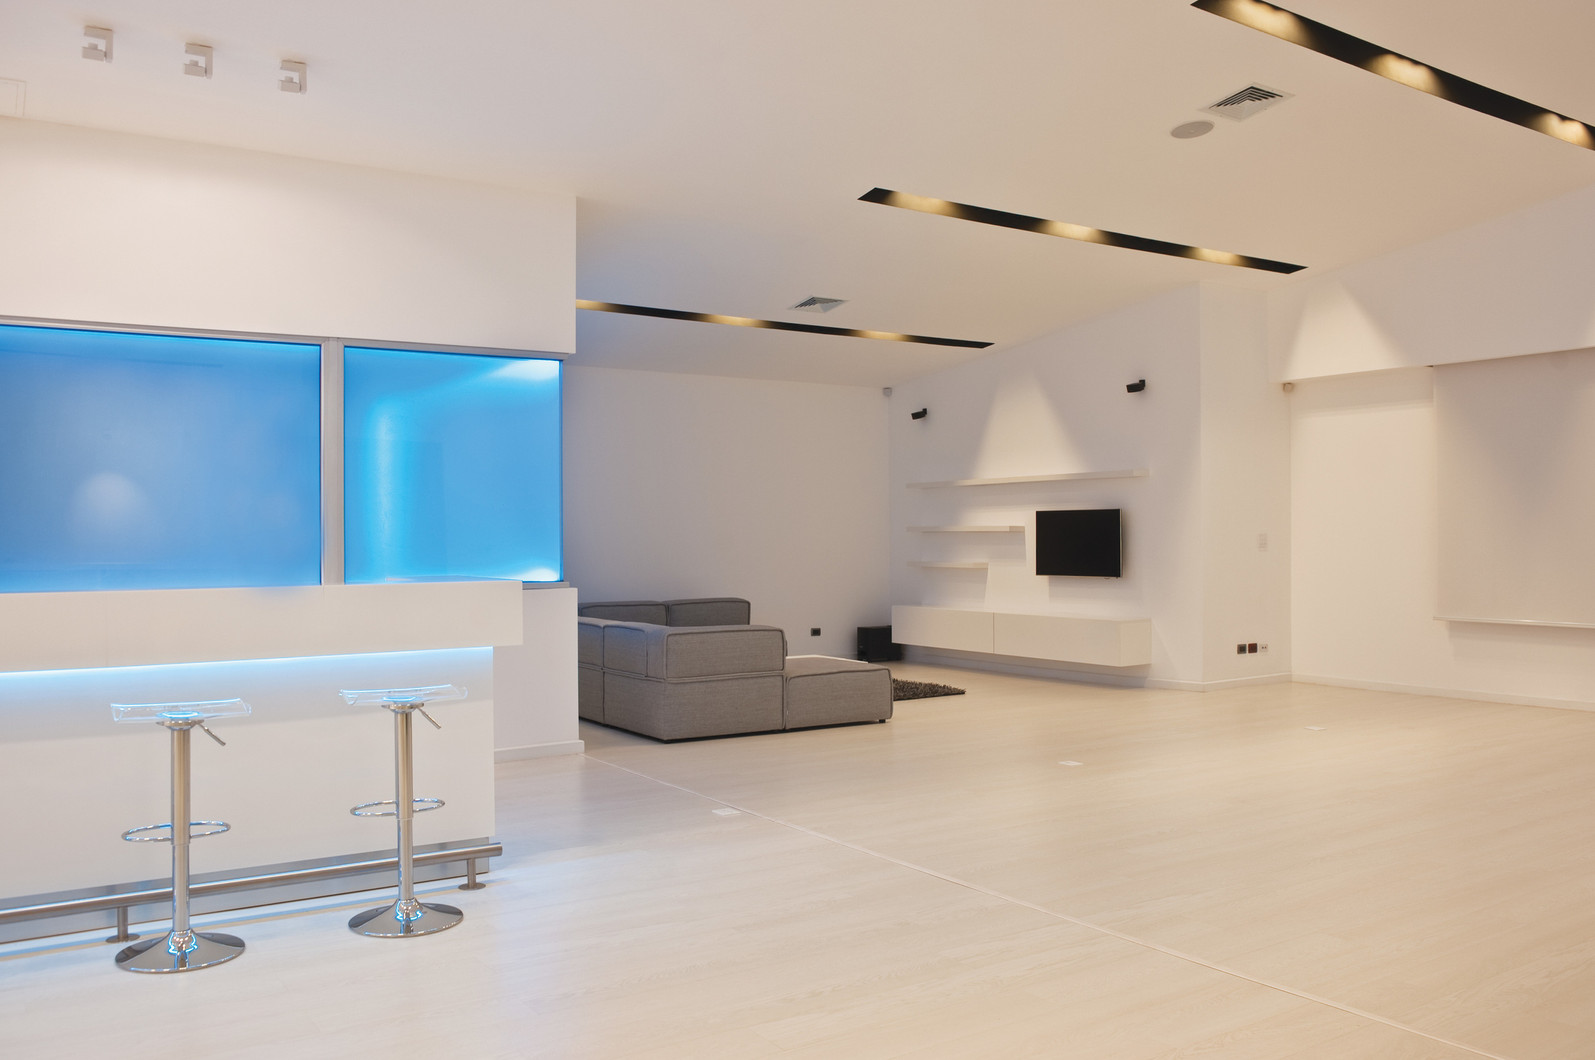 Area-Studio-04.jpg